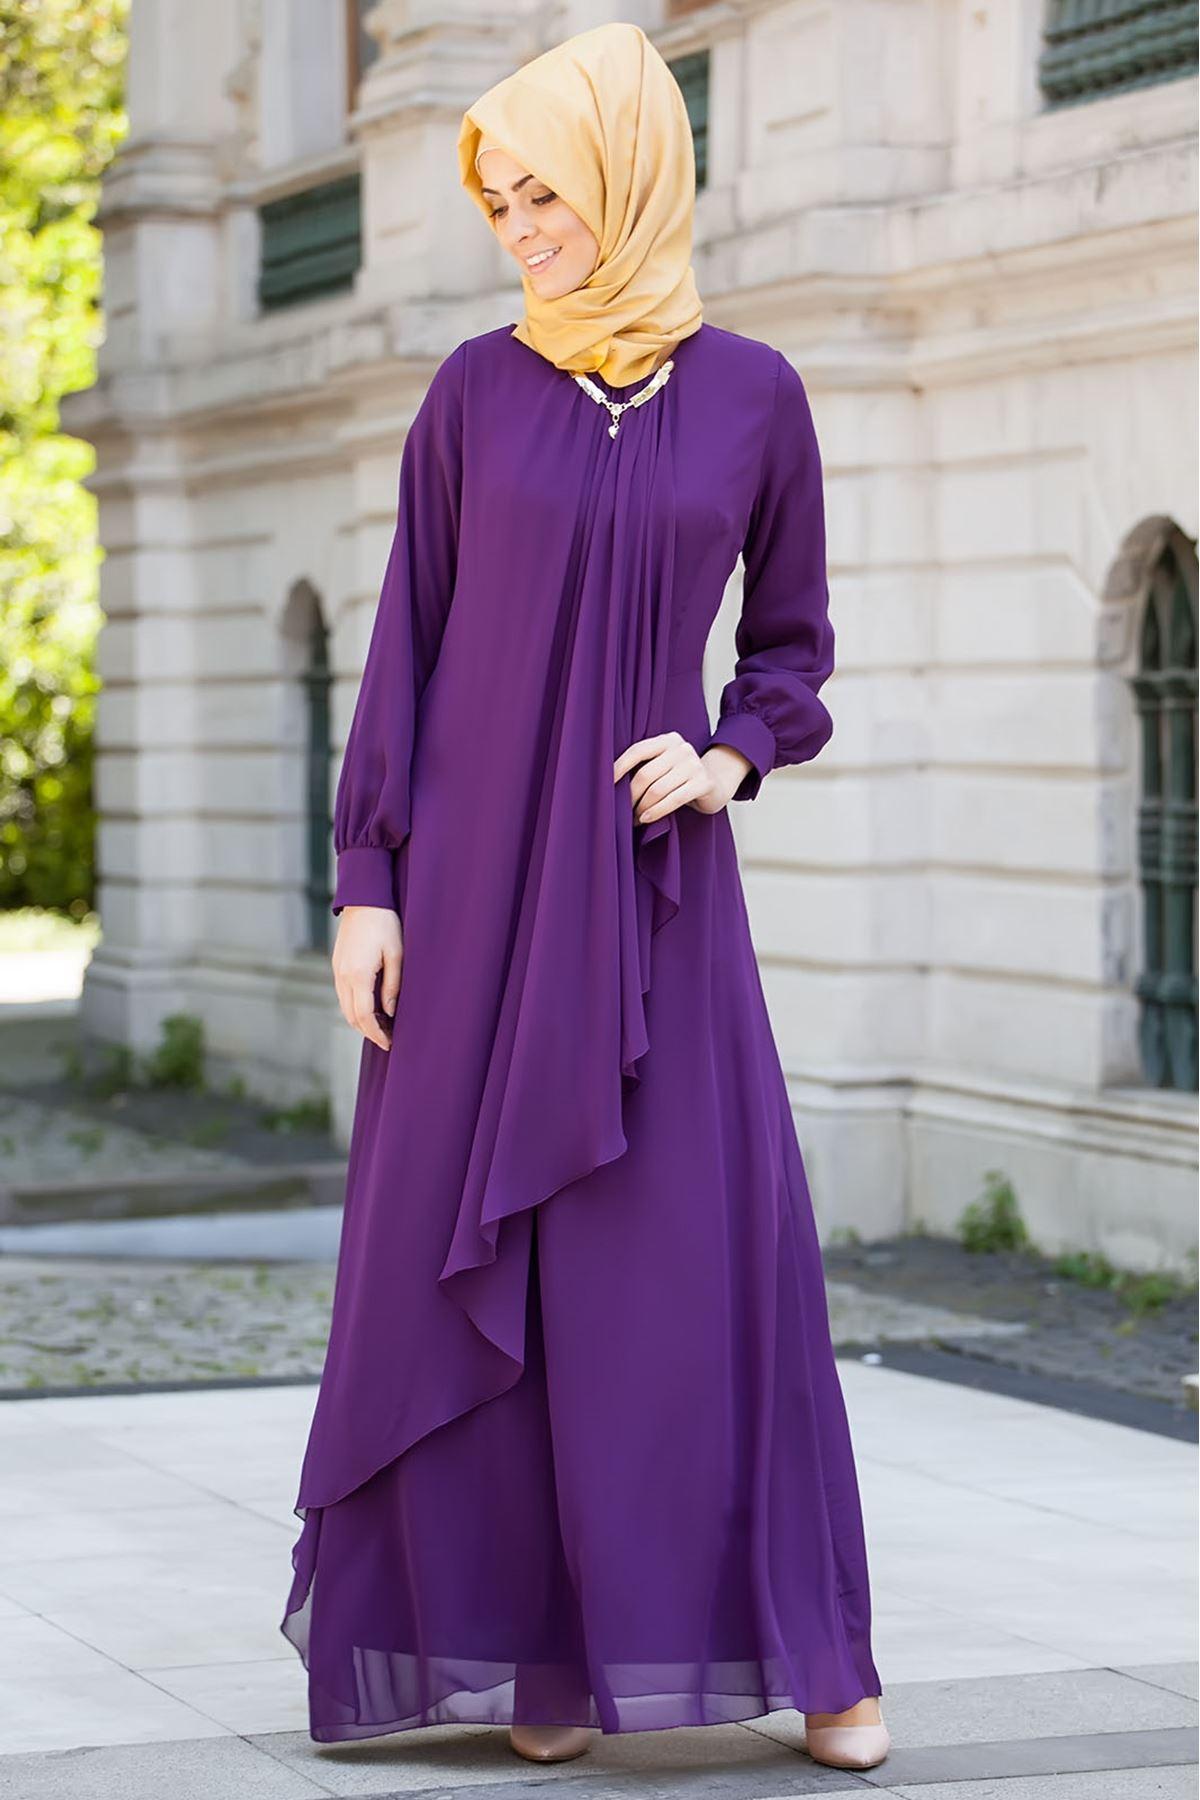 Partirti.com 1 TL Elbise - Patırtı 1 TL  Kampanyası